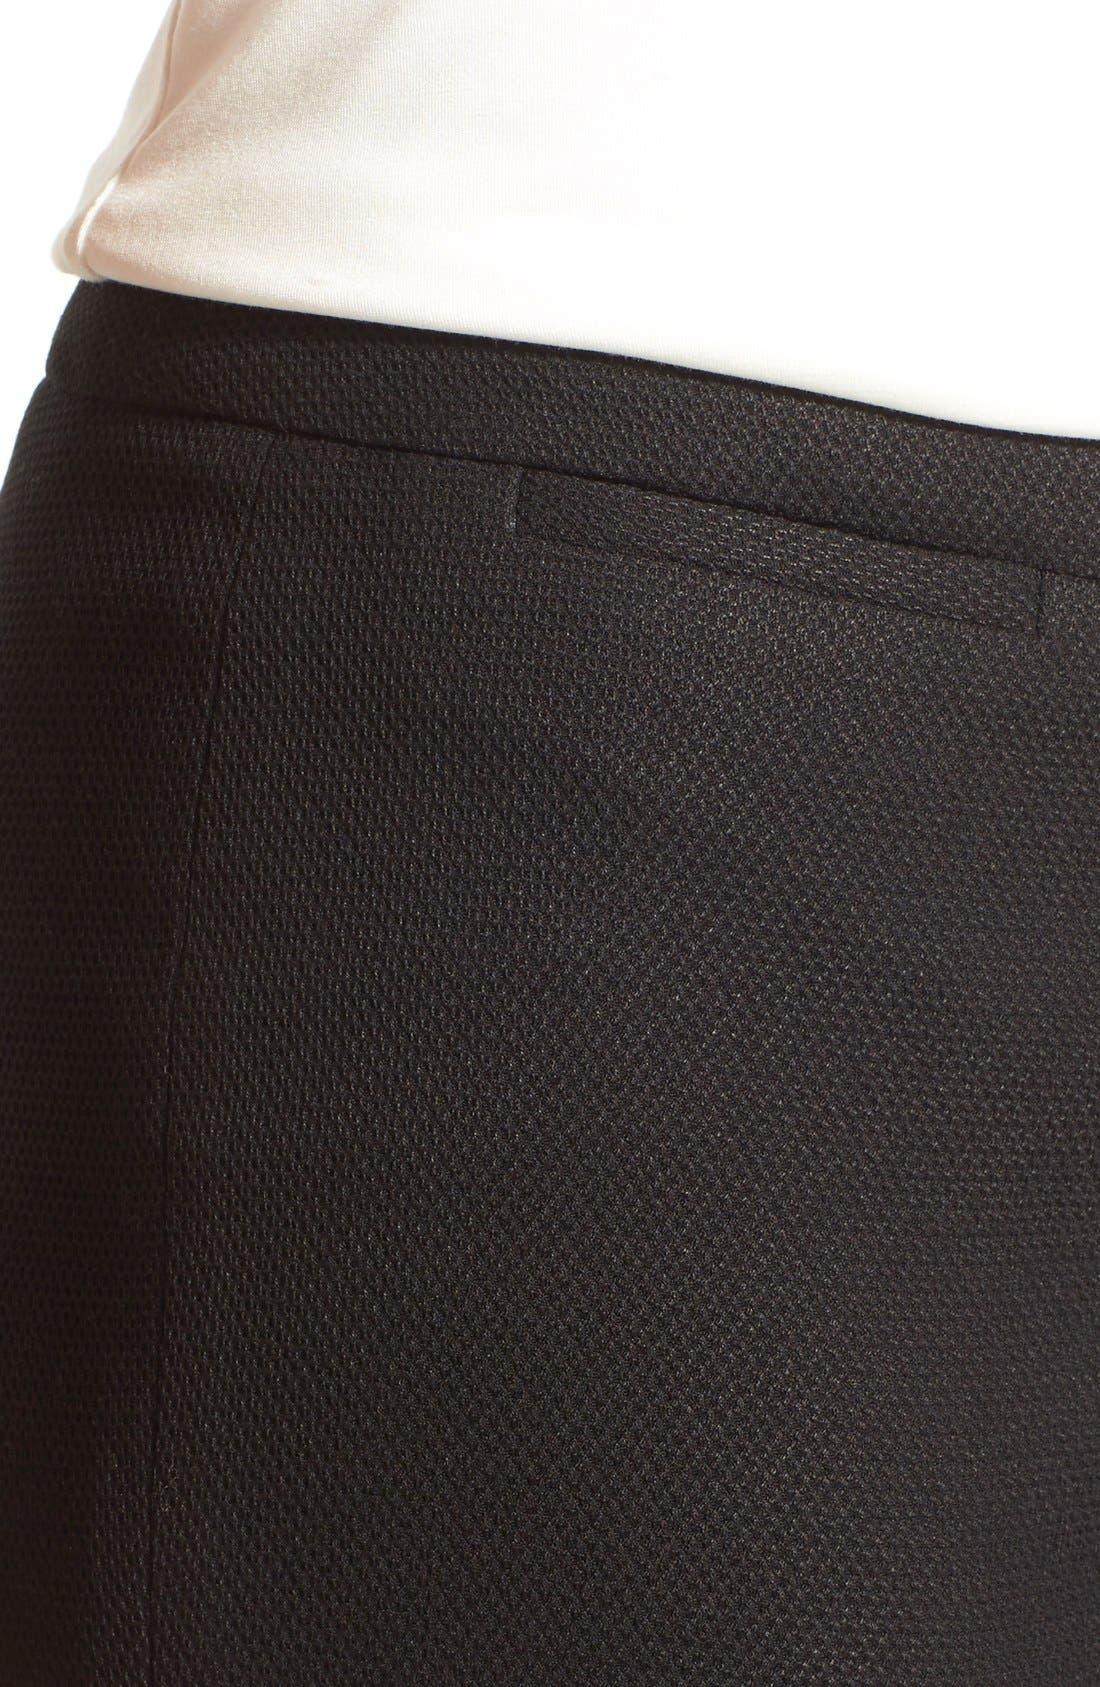 Alternate Image 4  - Halogen® 'Quinn' Diamond Stretch Pants